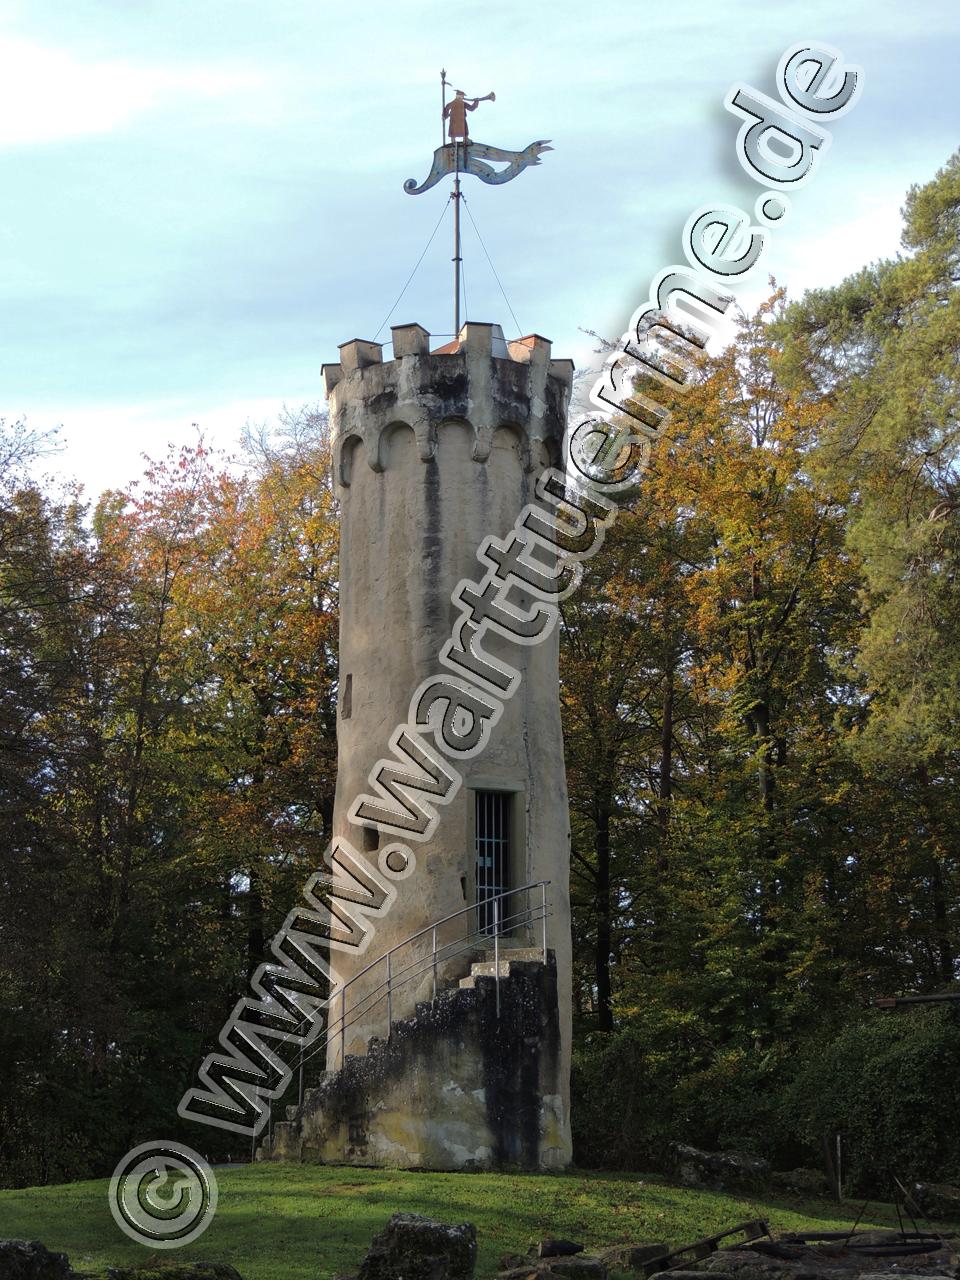 wartbergturm-kuenzelsau-1280px